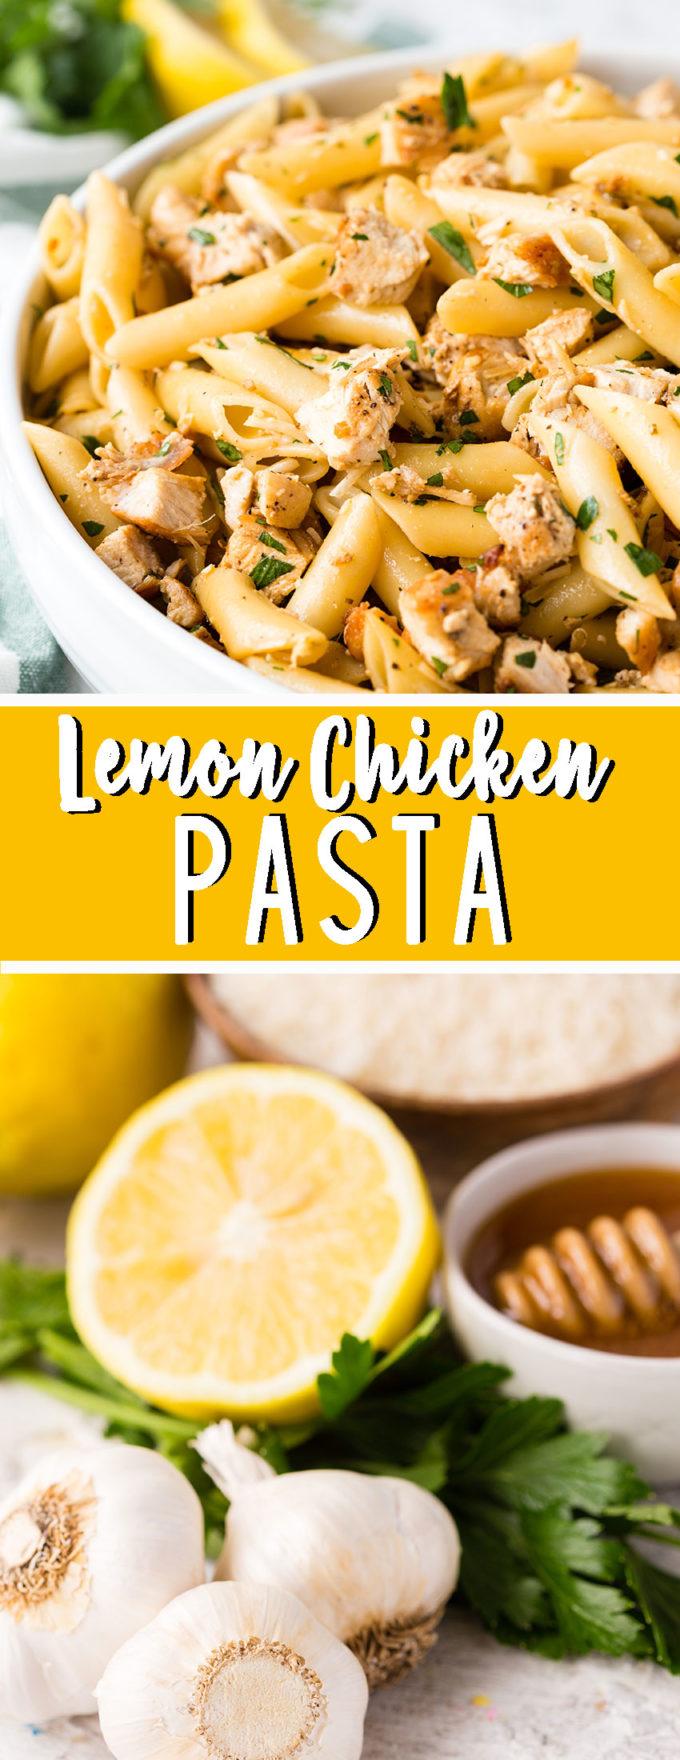 Delicious lemon chicken pasta, full of lemony chicken, fresh herbs, and more. Yum!